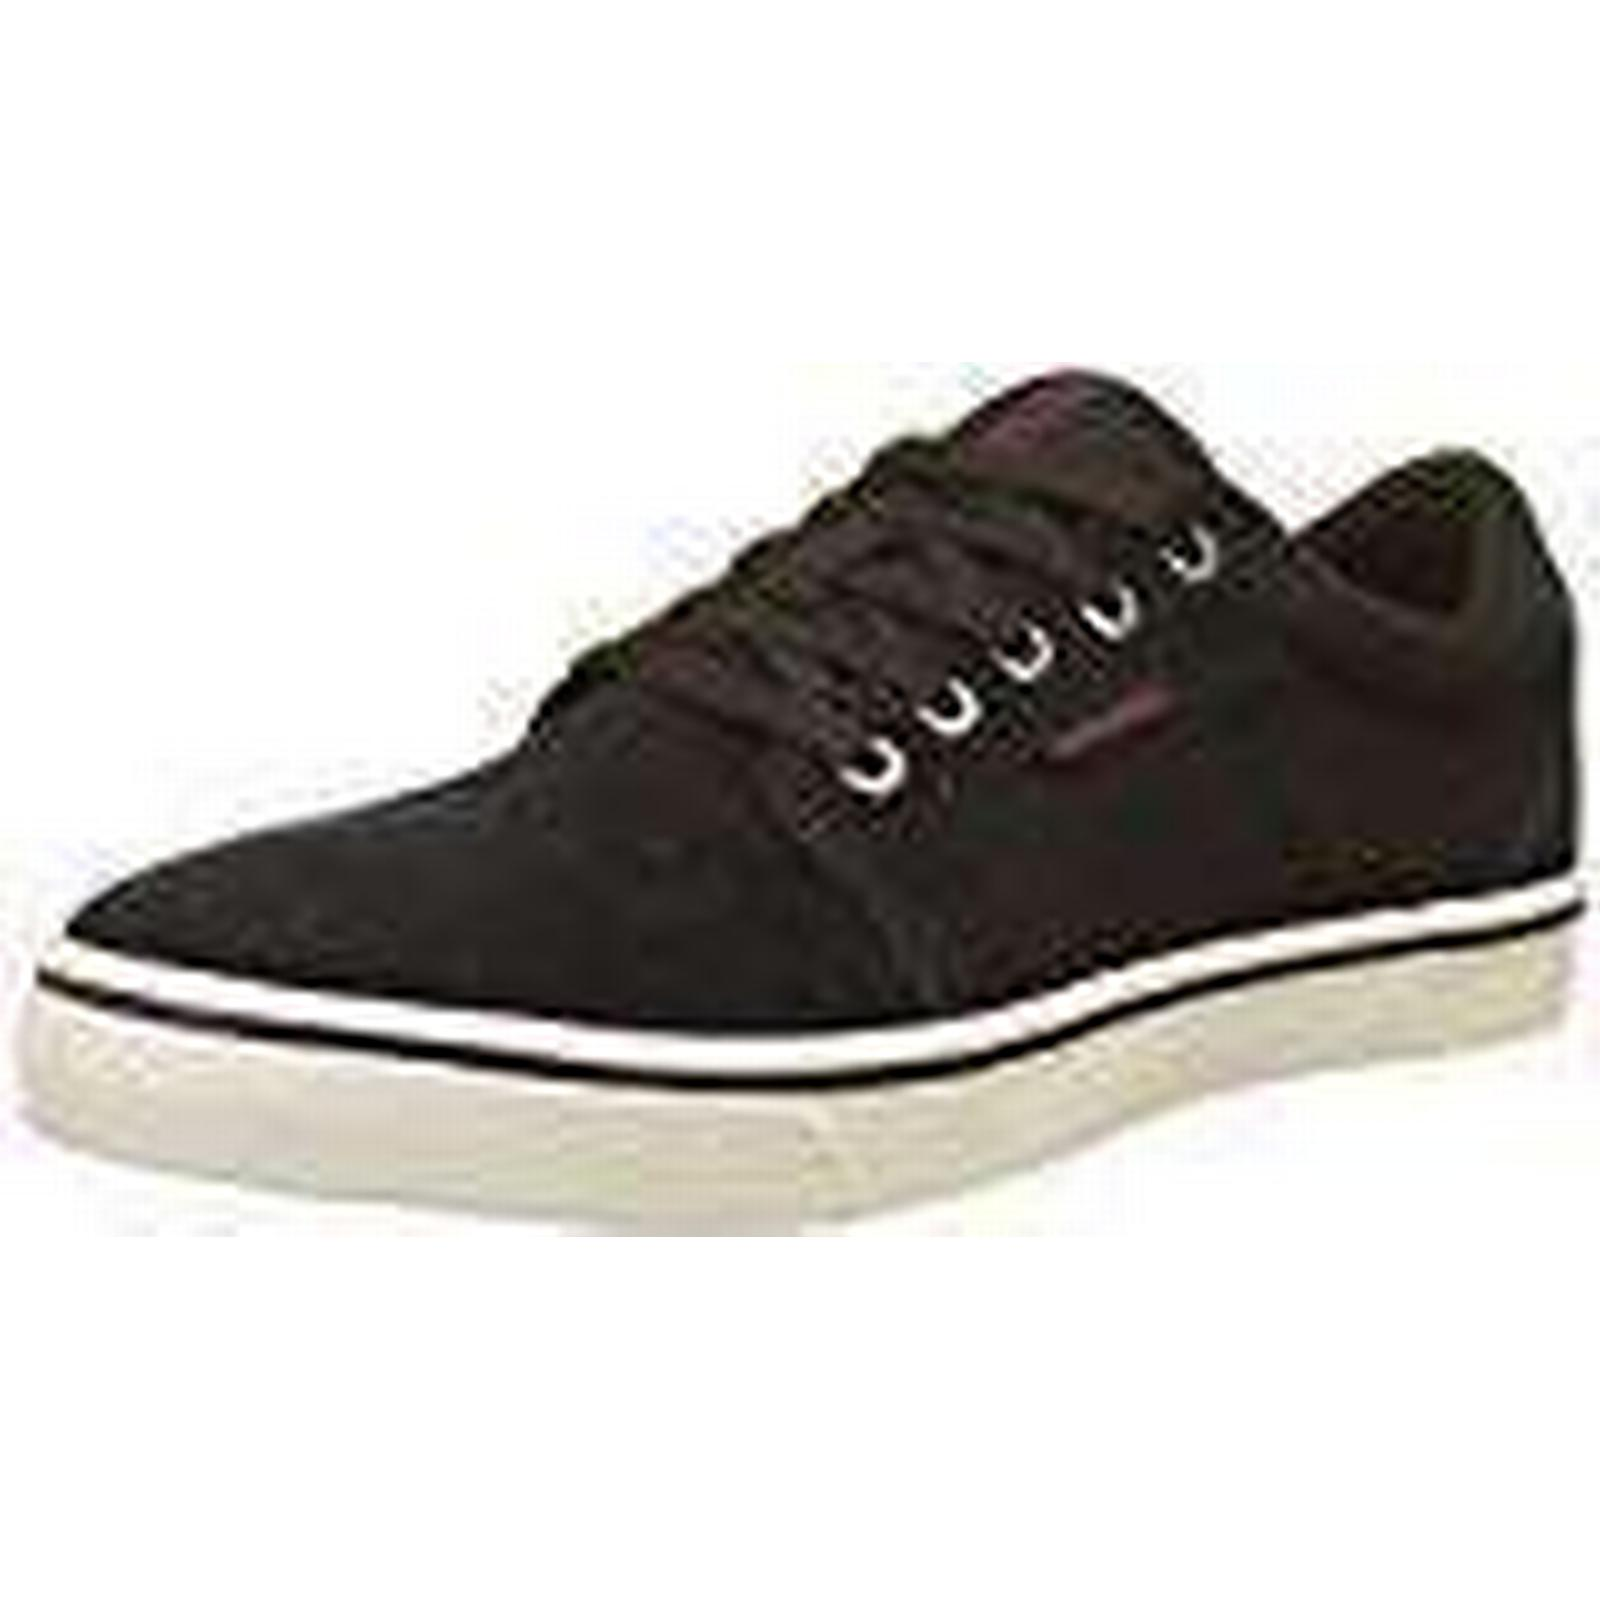 Jack & Anthracite Jones Men''s Jfwdandy Nubuck Anthracite & Low-Top Sneakers, Grey, 8 UK 05be6f